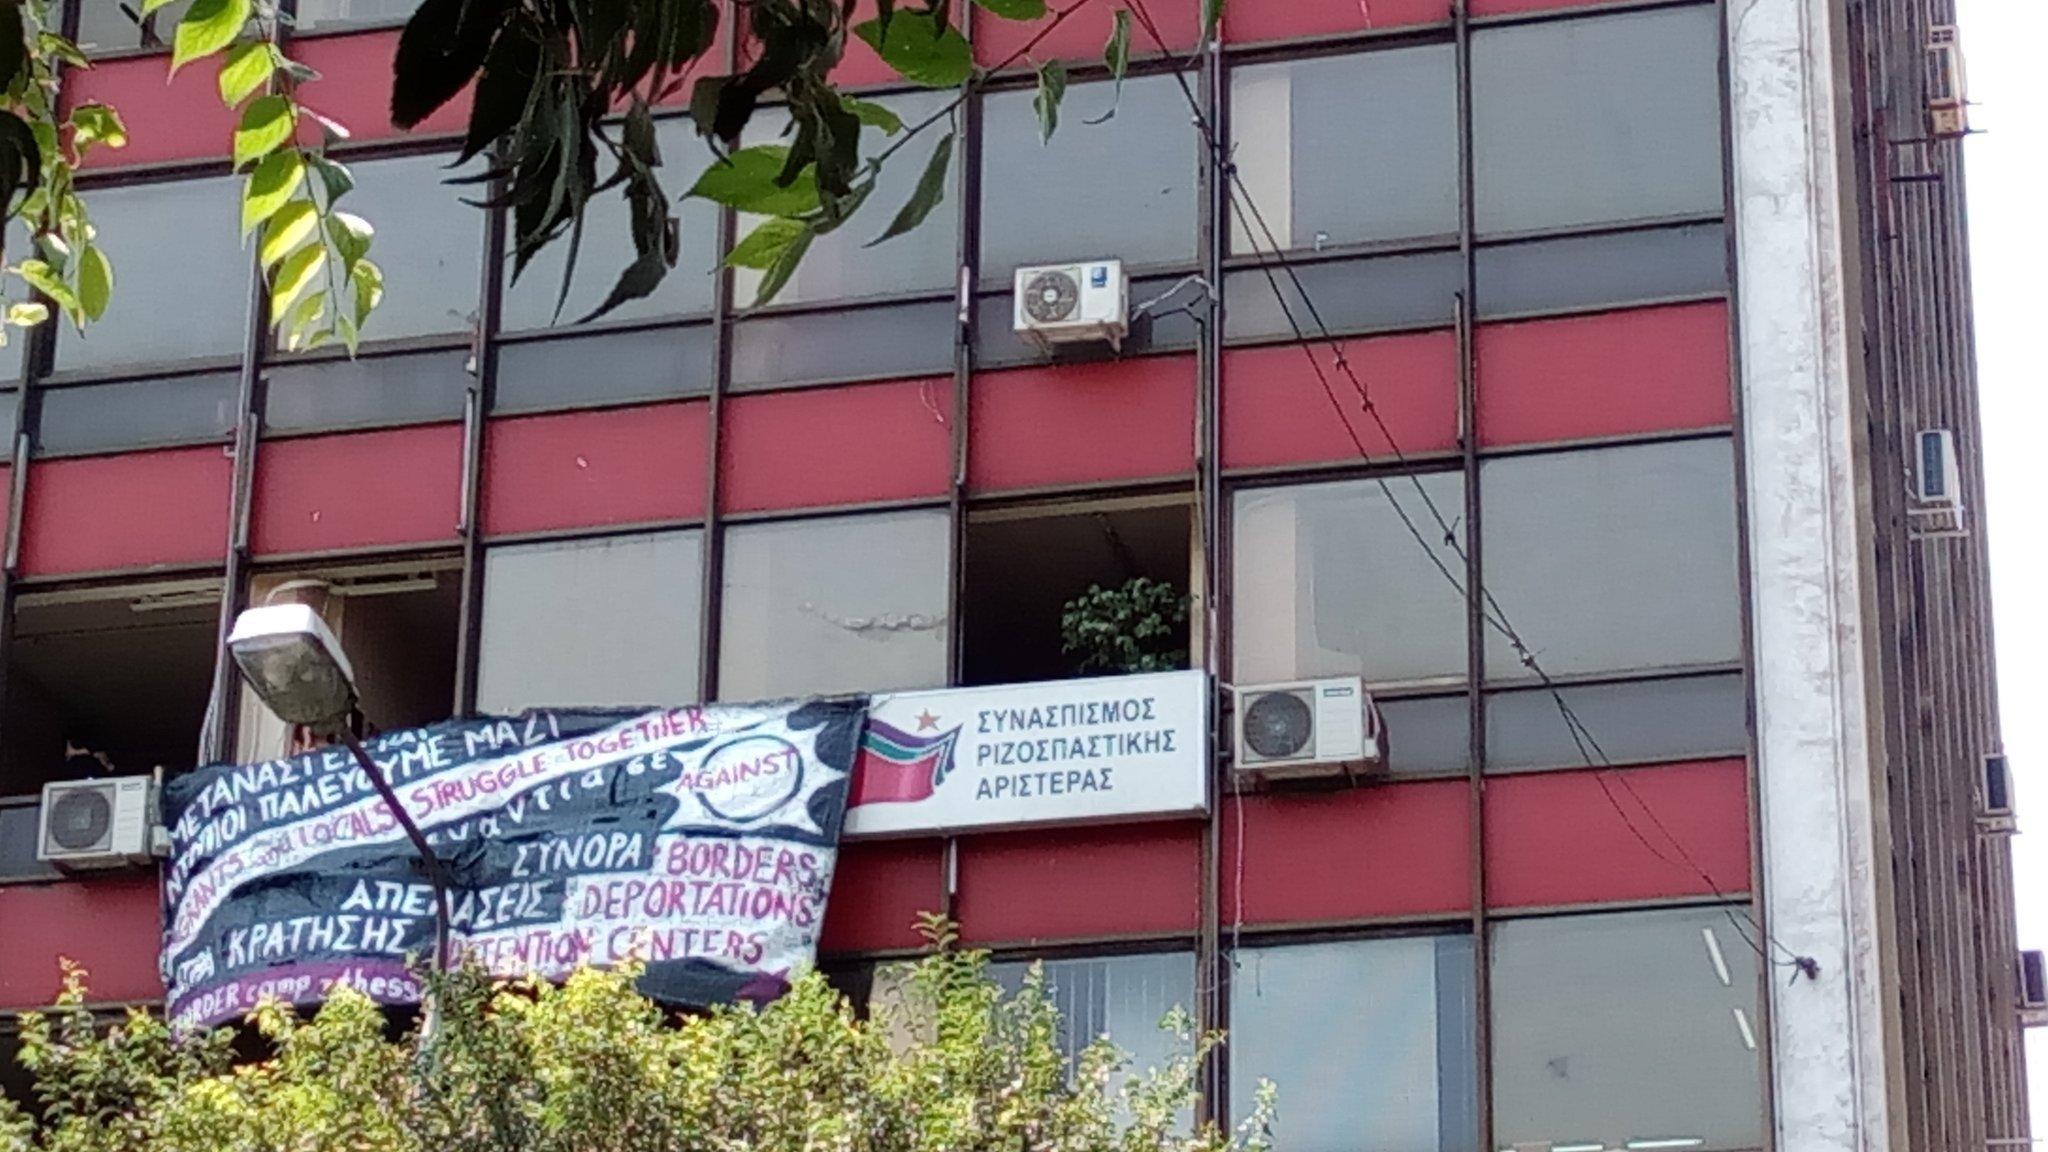 20160729_Syriza_offices_occupied_Thessaloniki_Greece